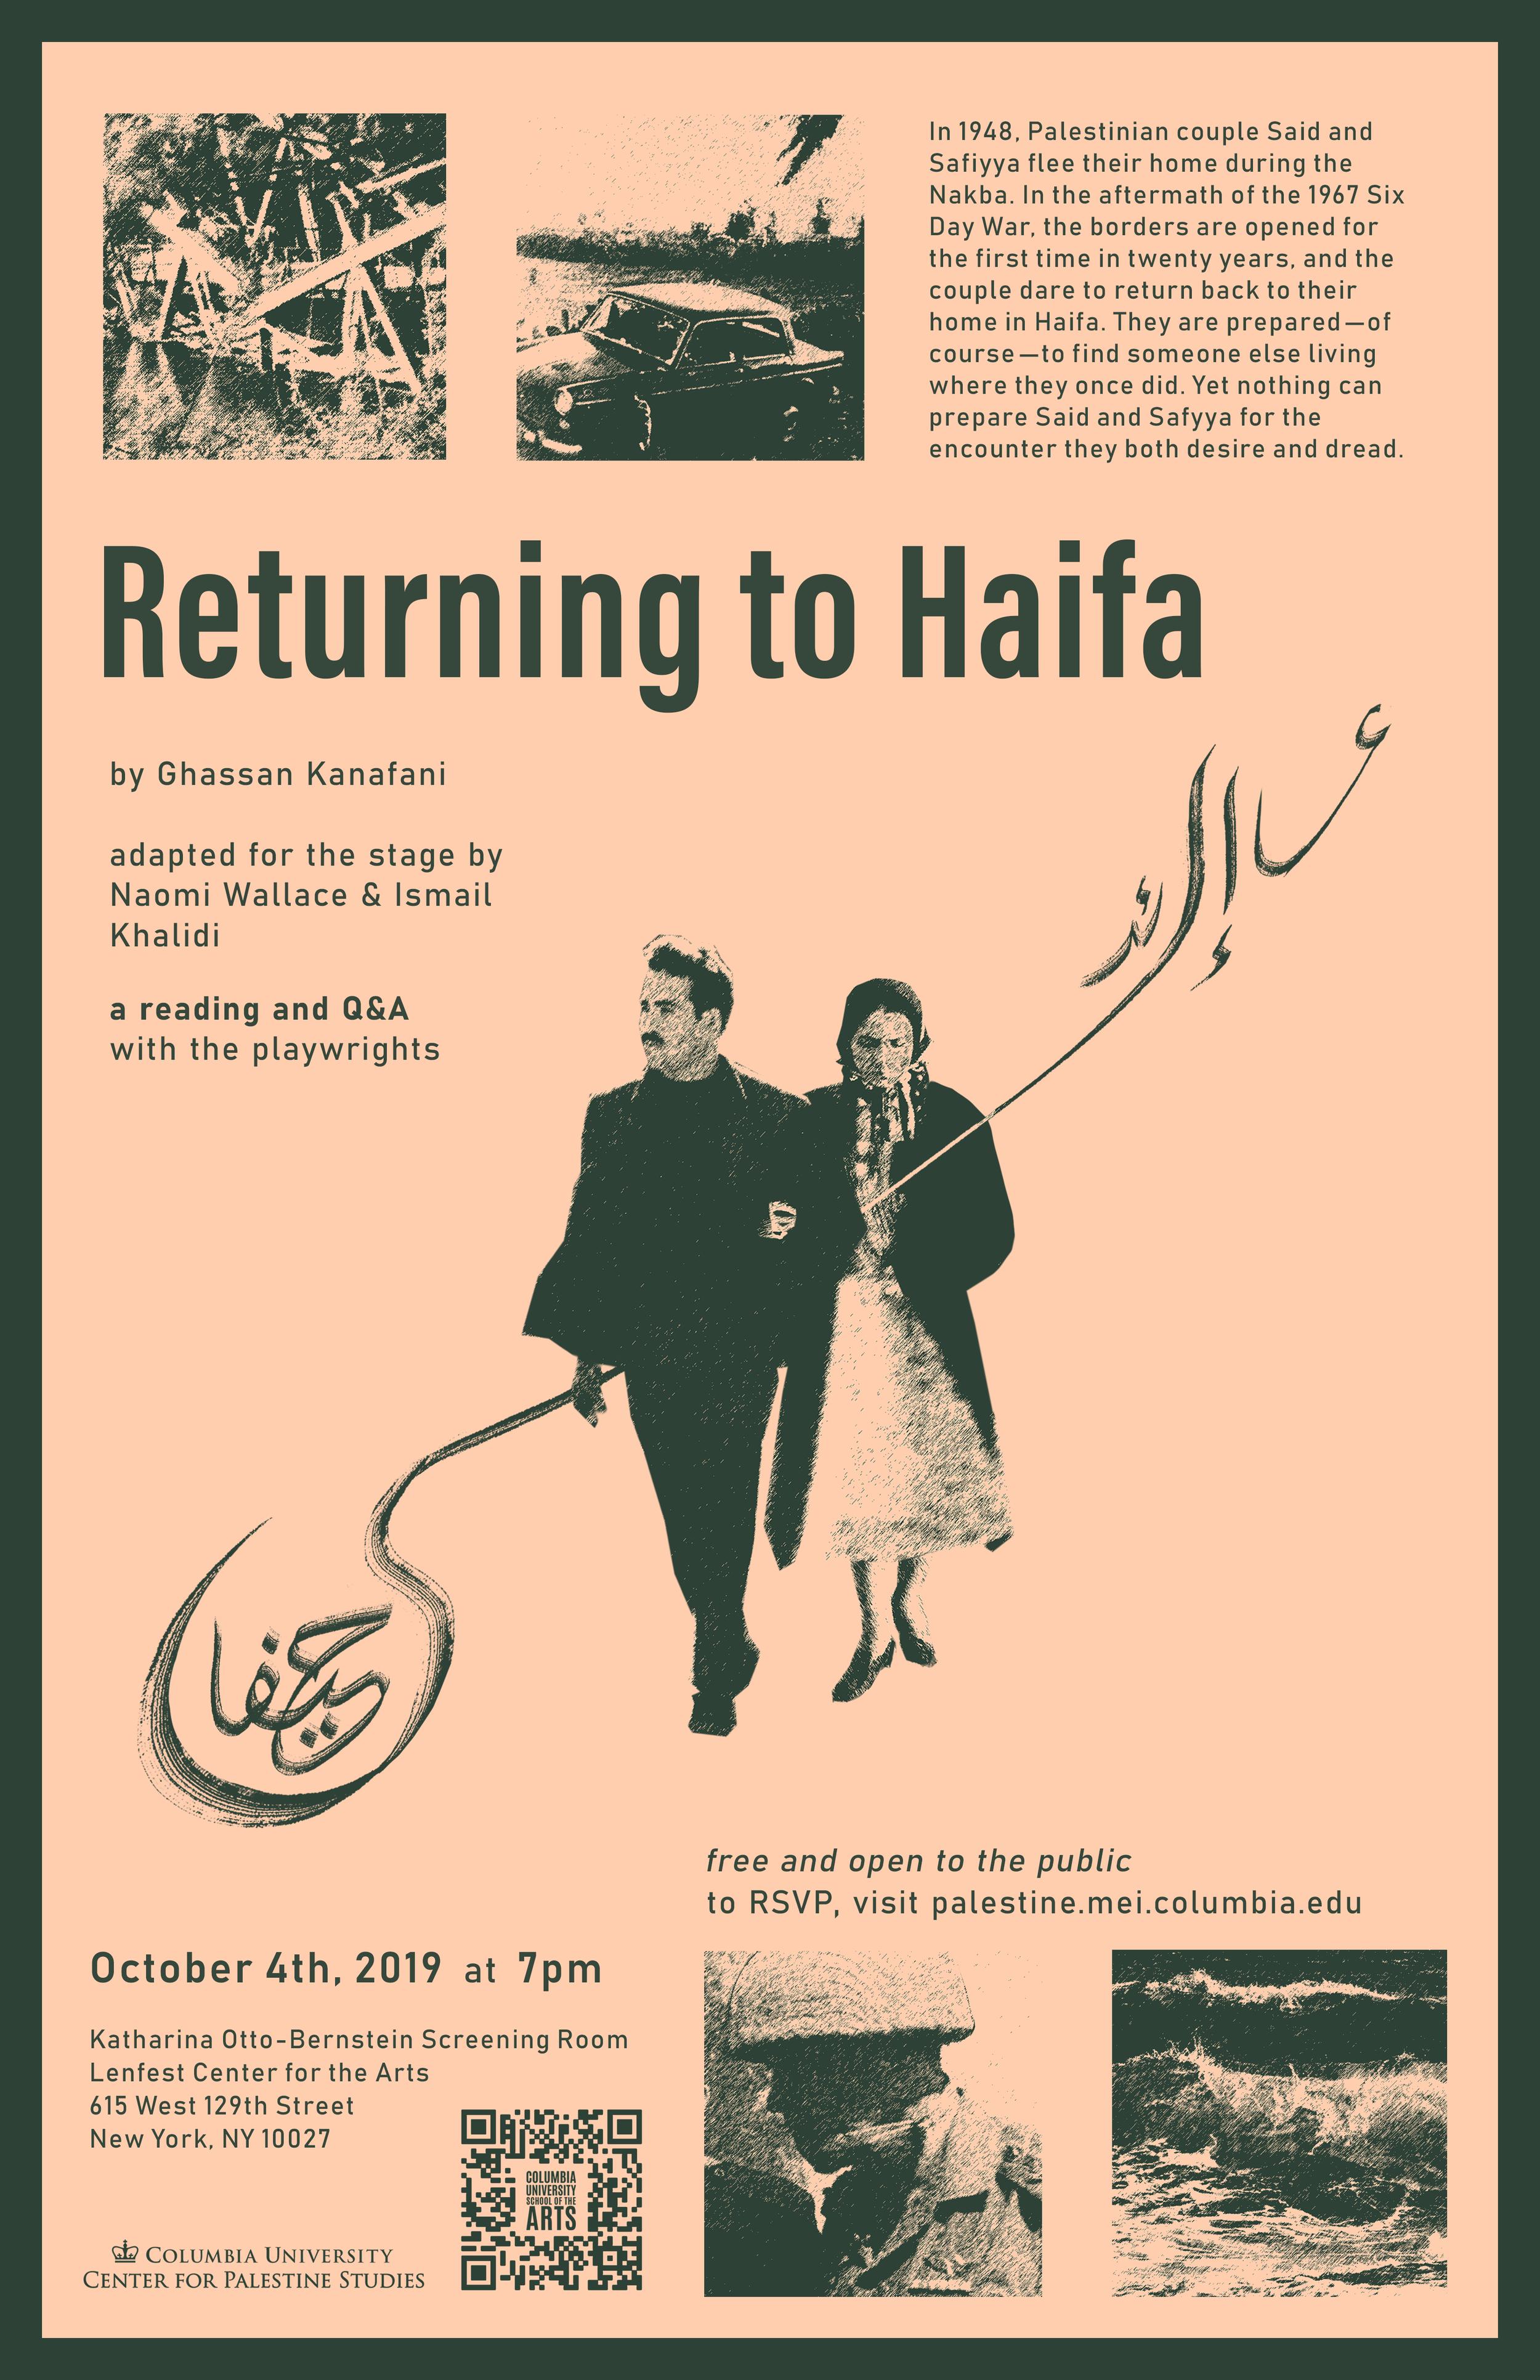 RETURNING TO HAIFA 09 11 2019 v2.png